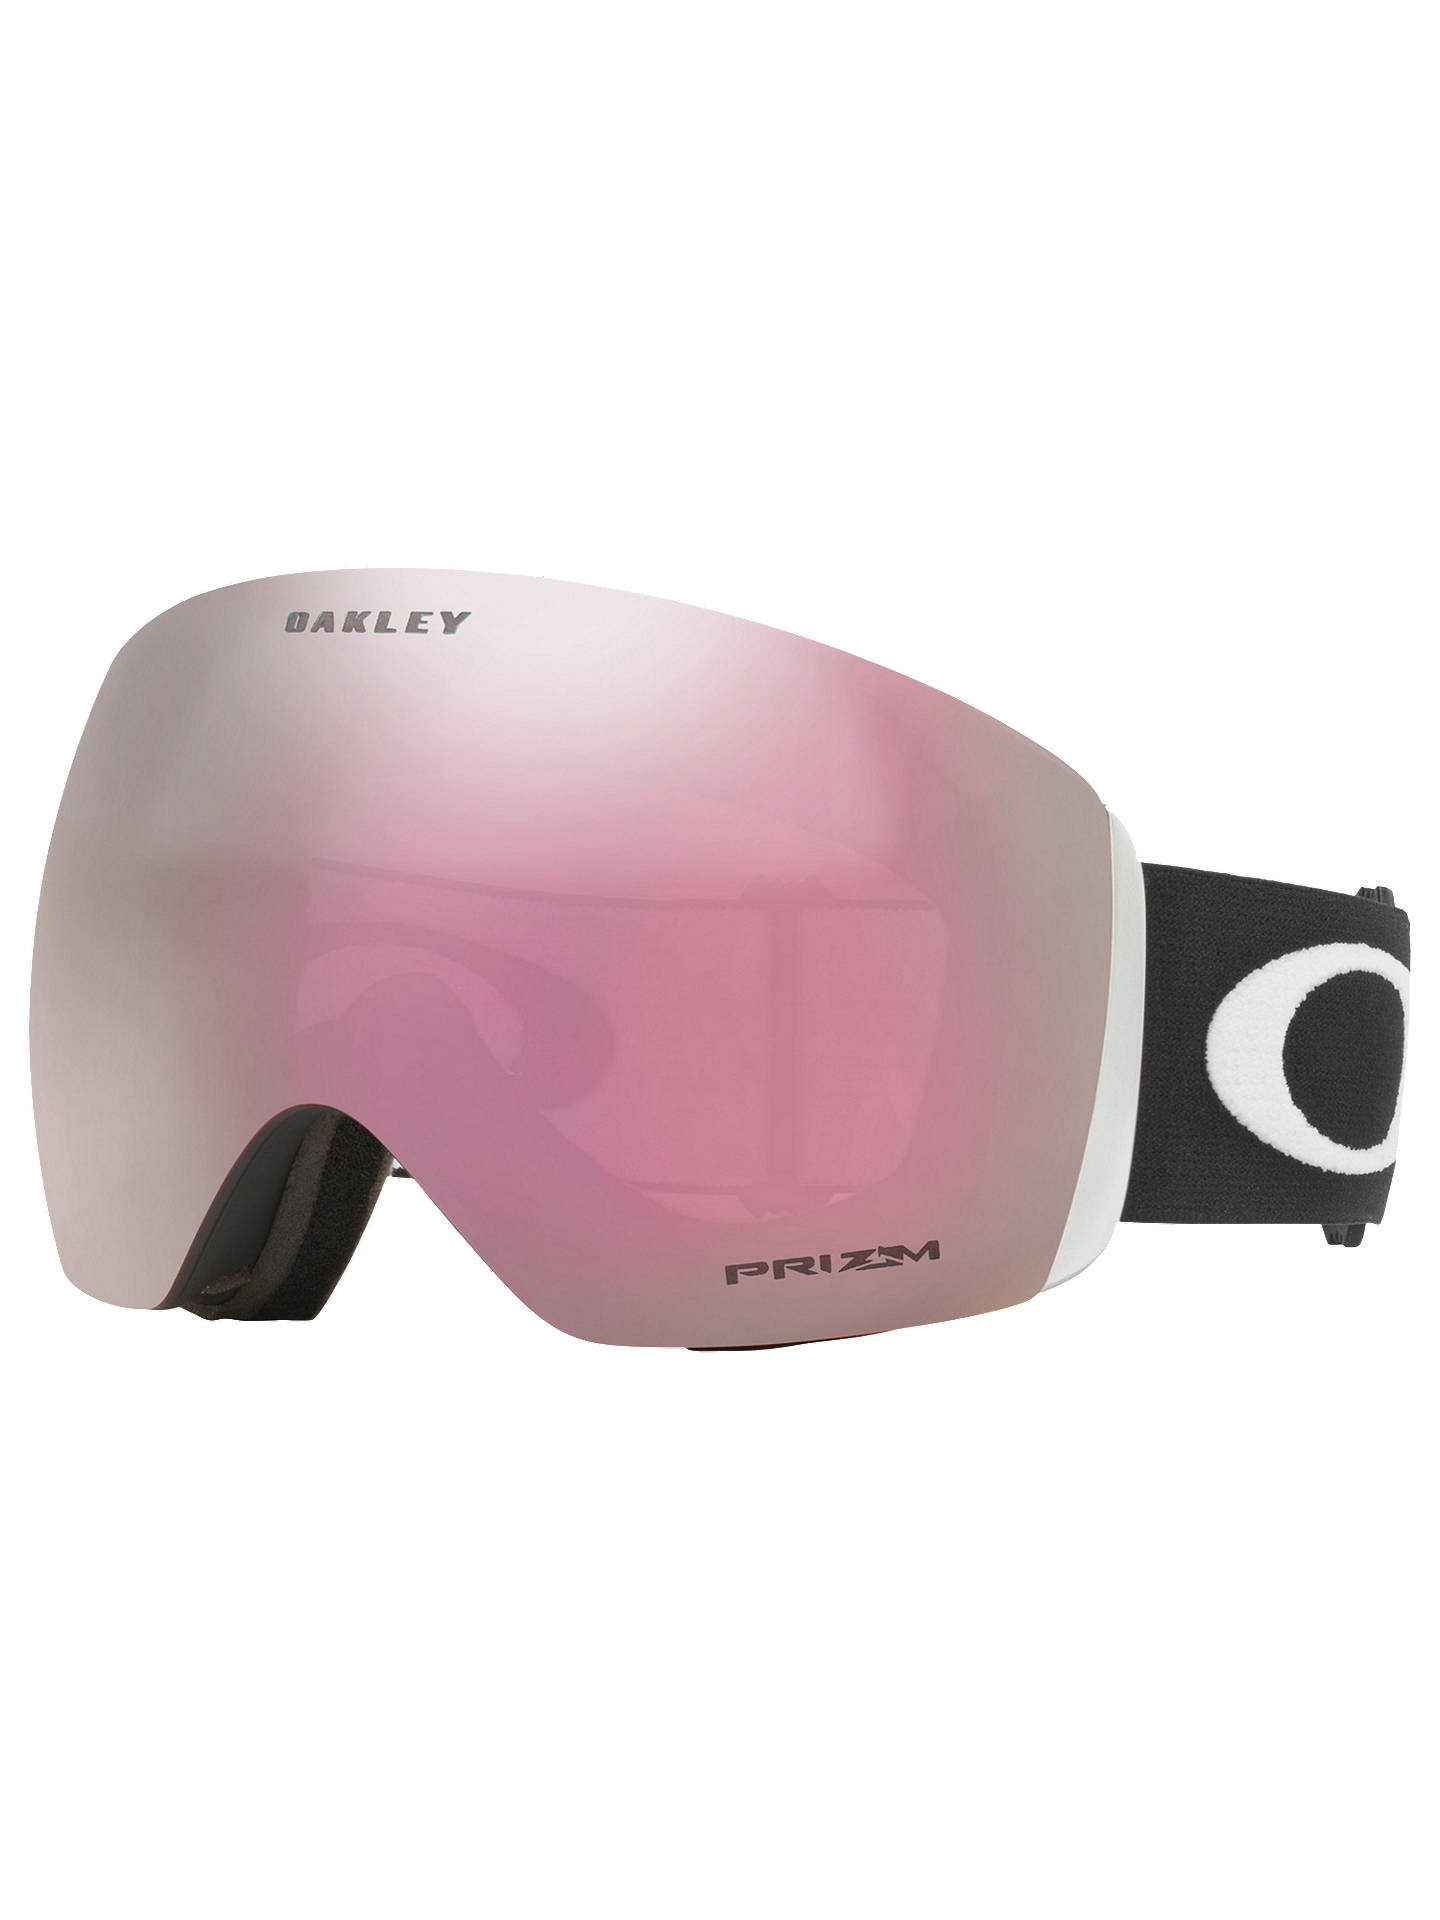 84eeae02edd Buy Oakley OO7050 Prizm™ Polarised Flight Deck™ Snow Goggles